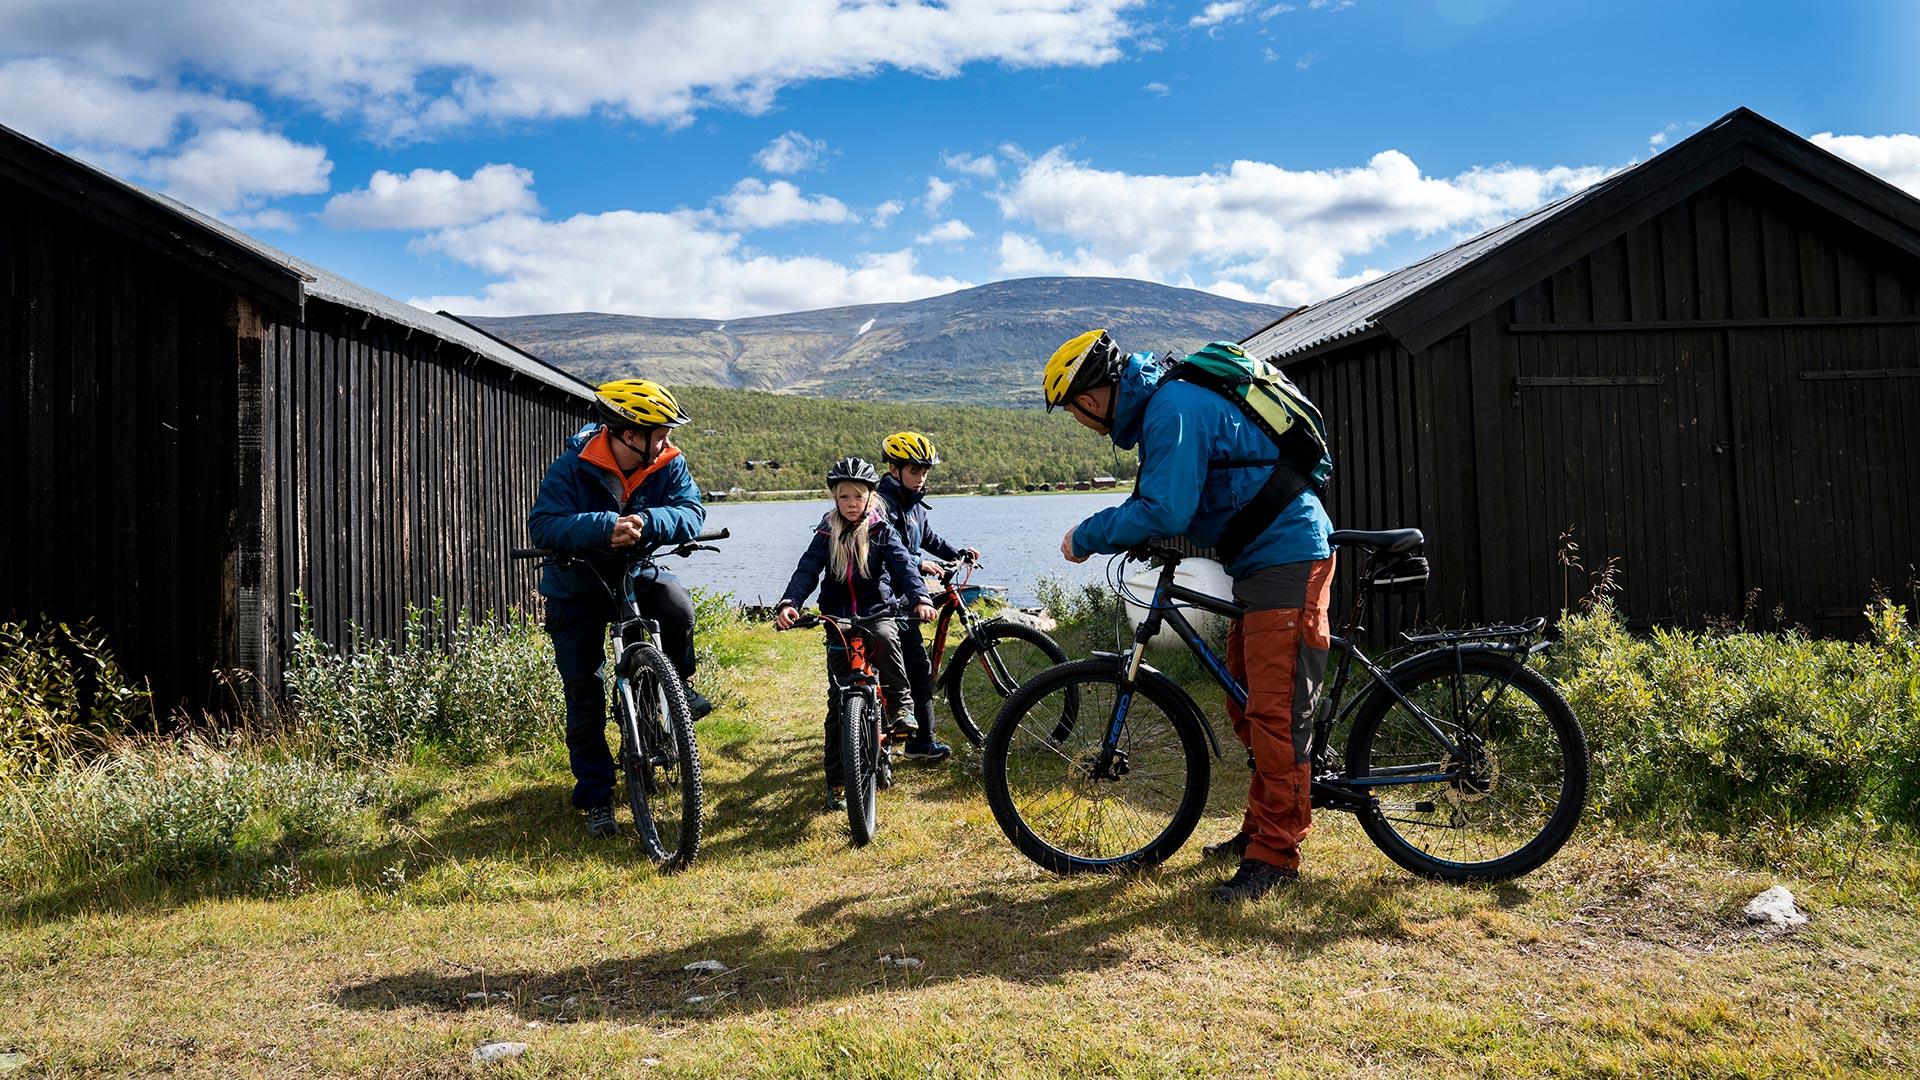 Family at bicycles.